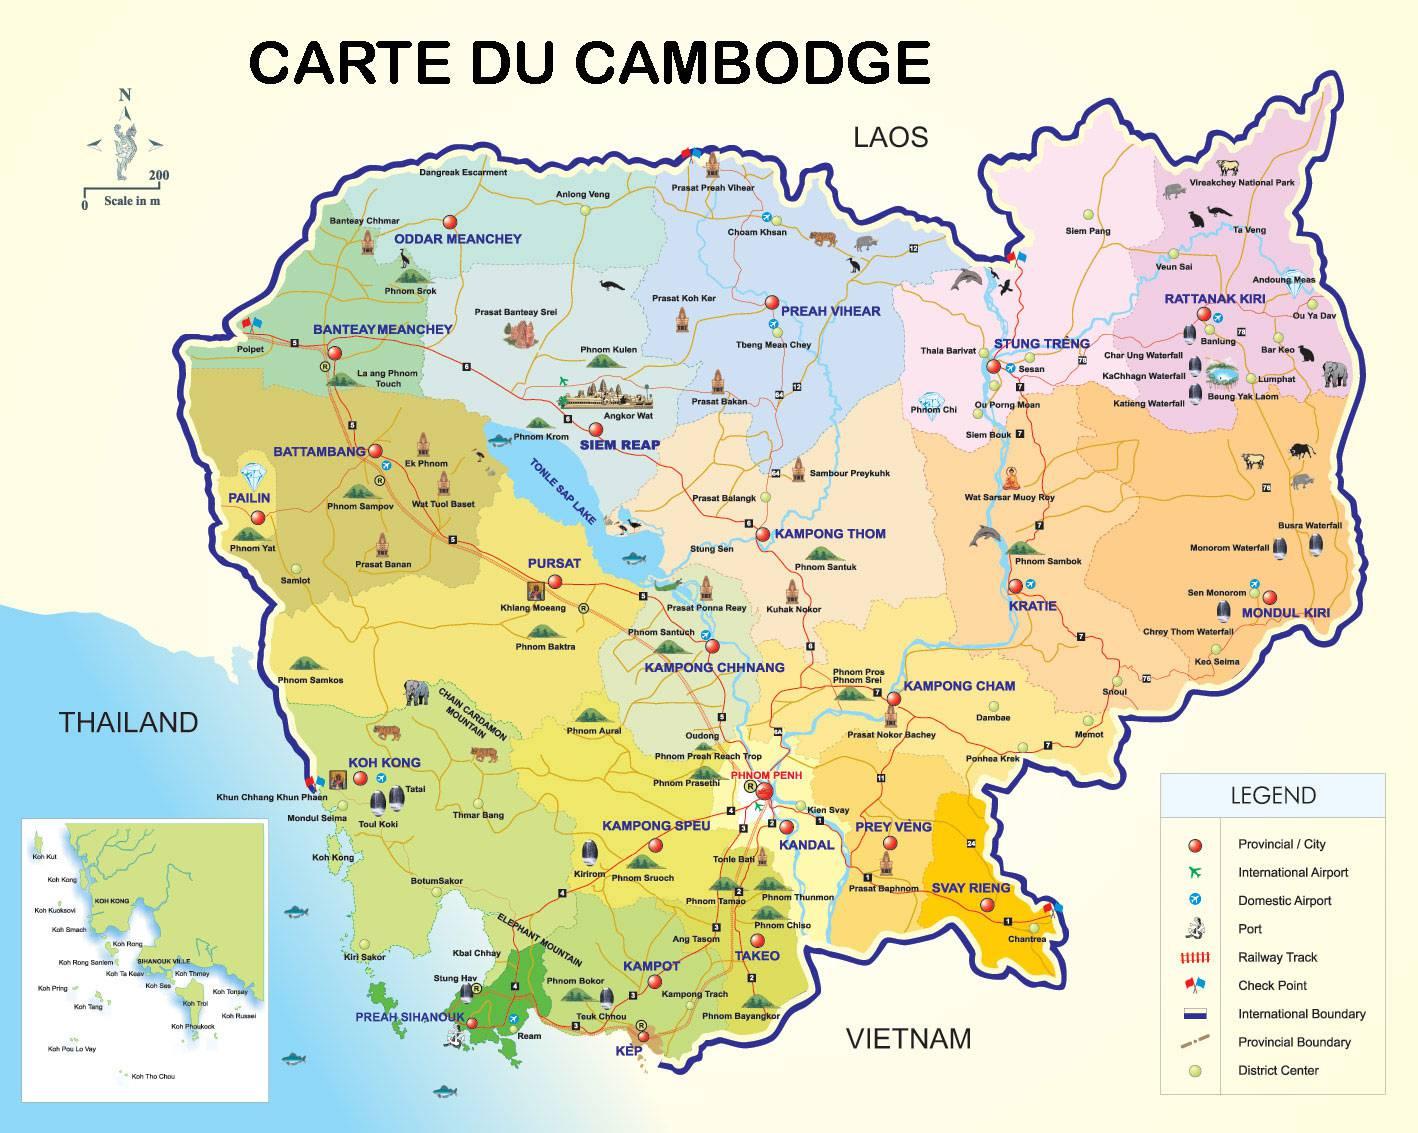 Carte touristique du Cambodge